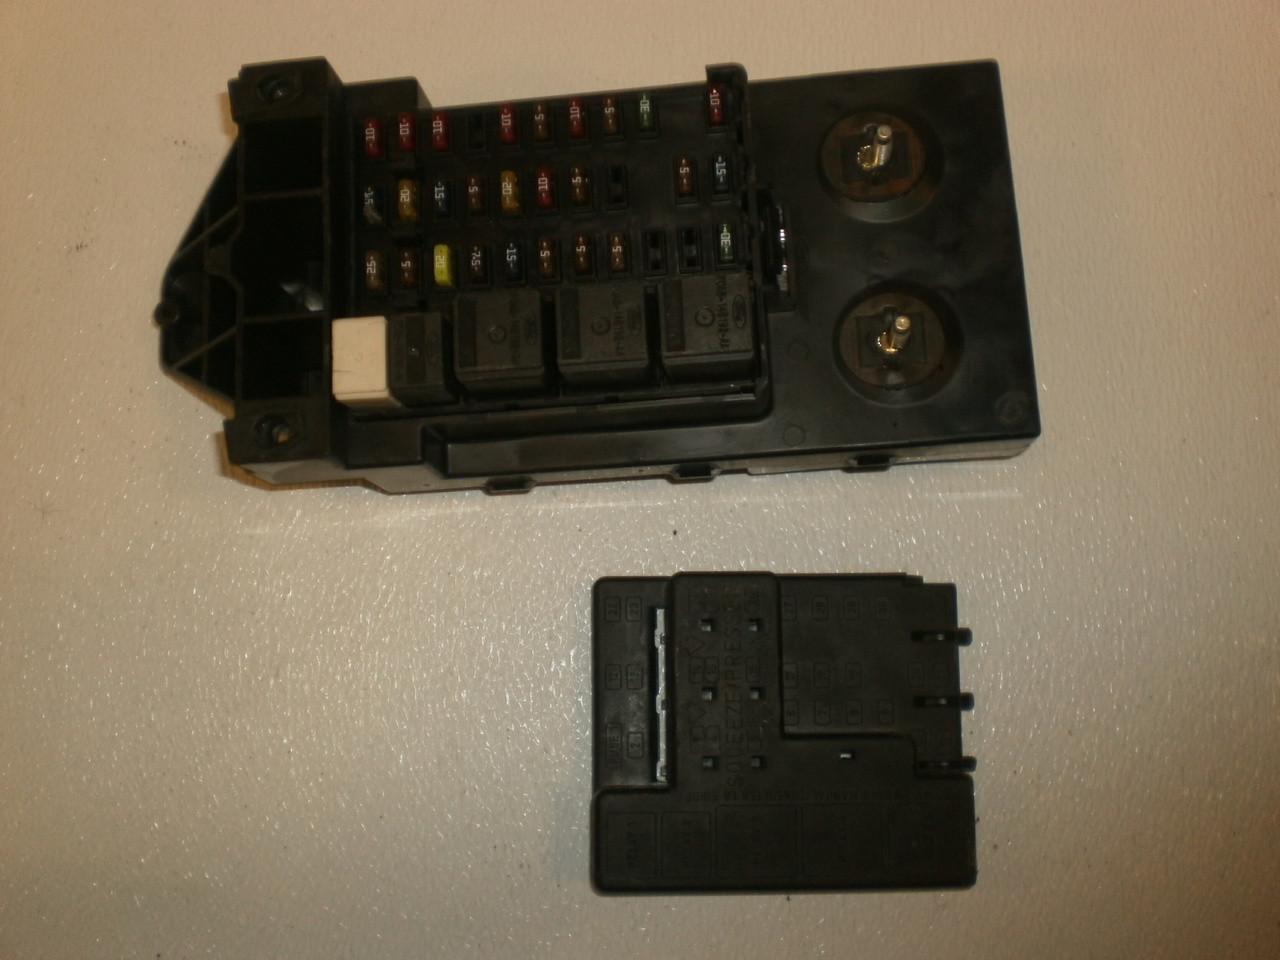 1994 1998 ford mustang right quarter panel scoop vent 94 95 gt cobra lx met green [ 1280 x 960 Pixel ]